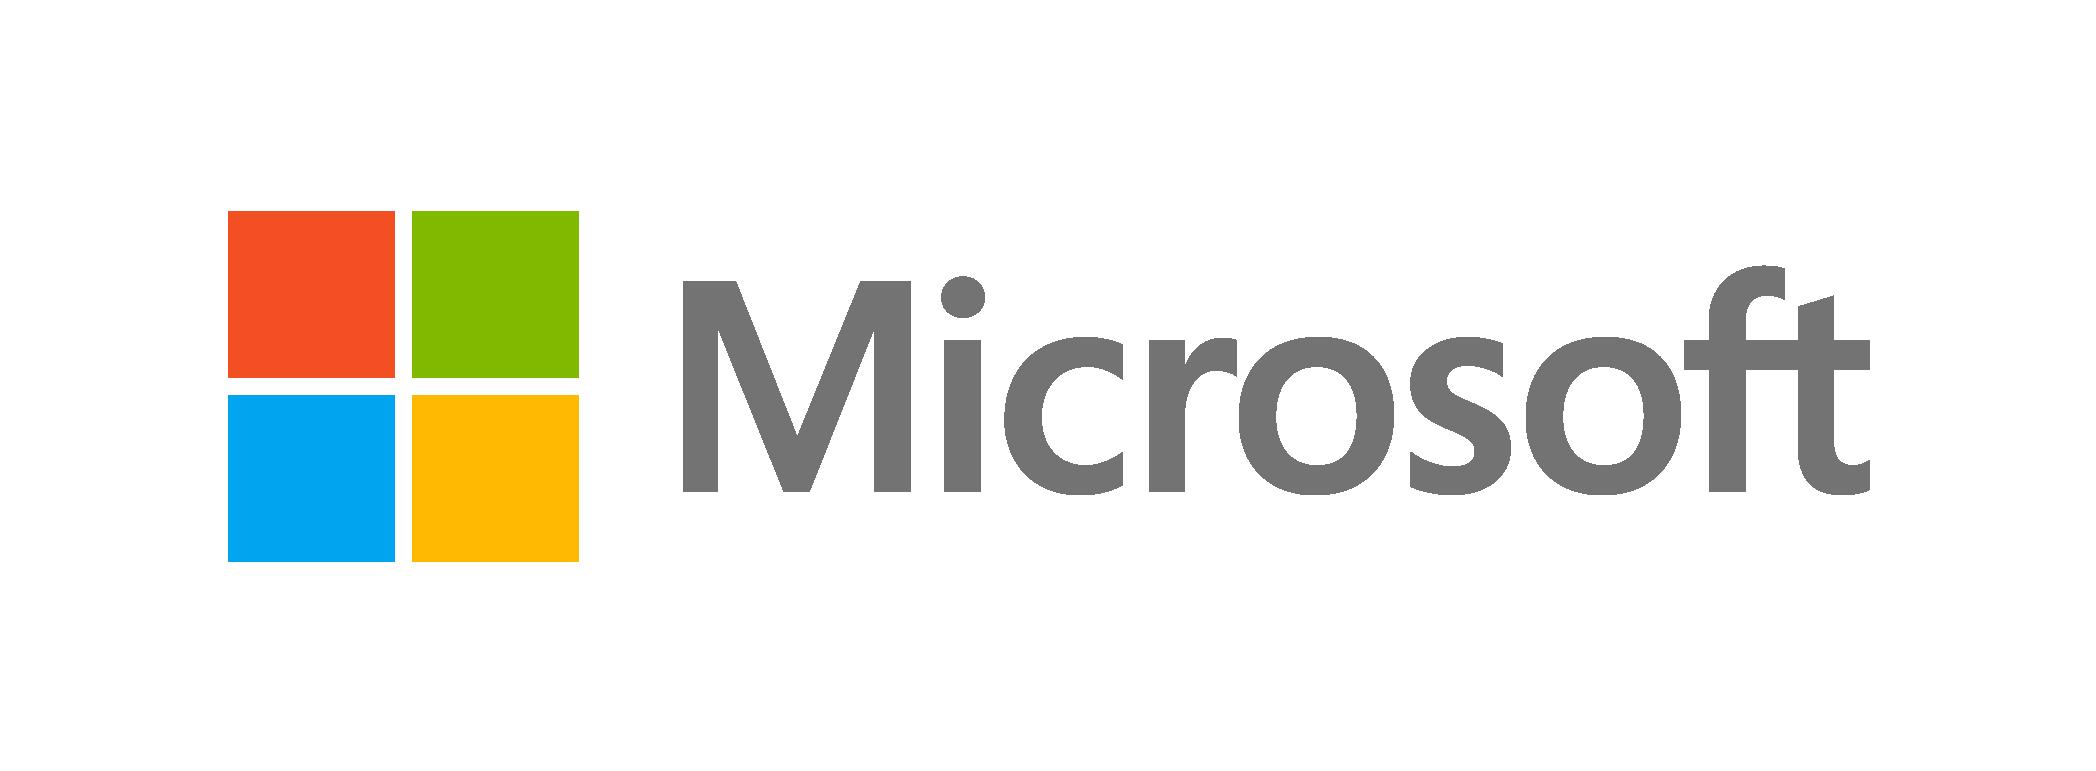 gratis windows 10